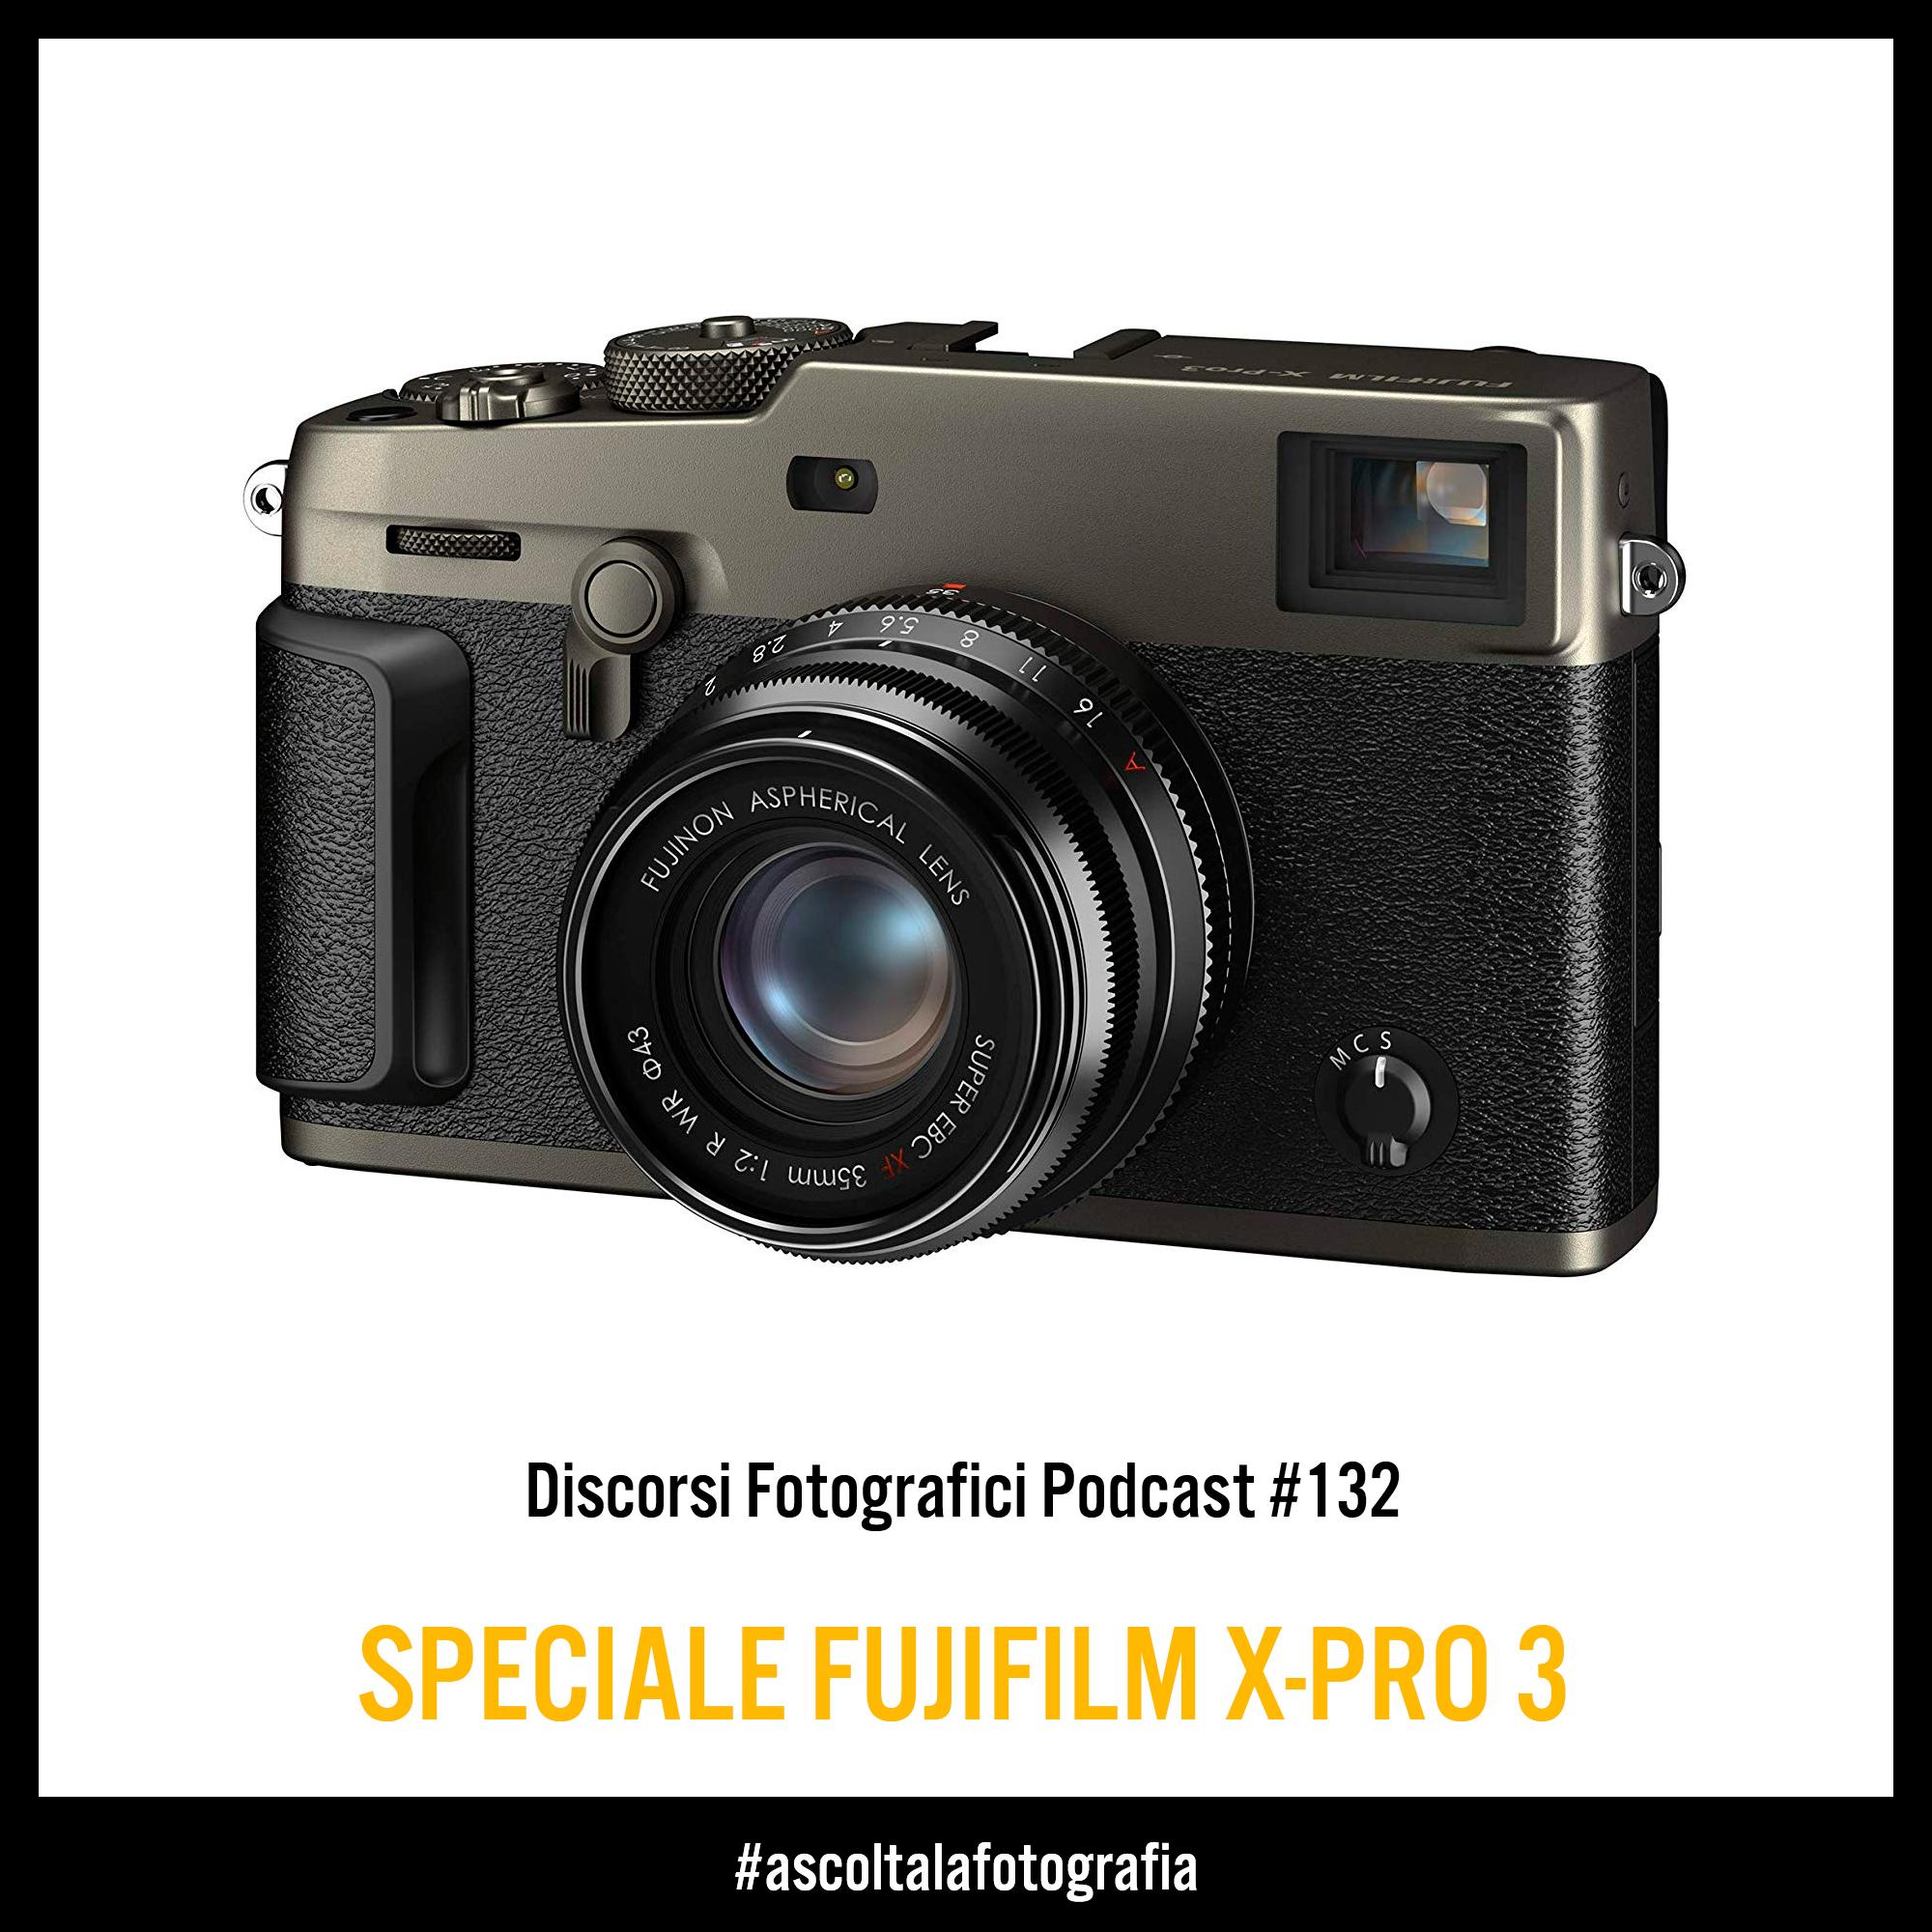 SPECIALE FUJIFILM XPRO-3